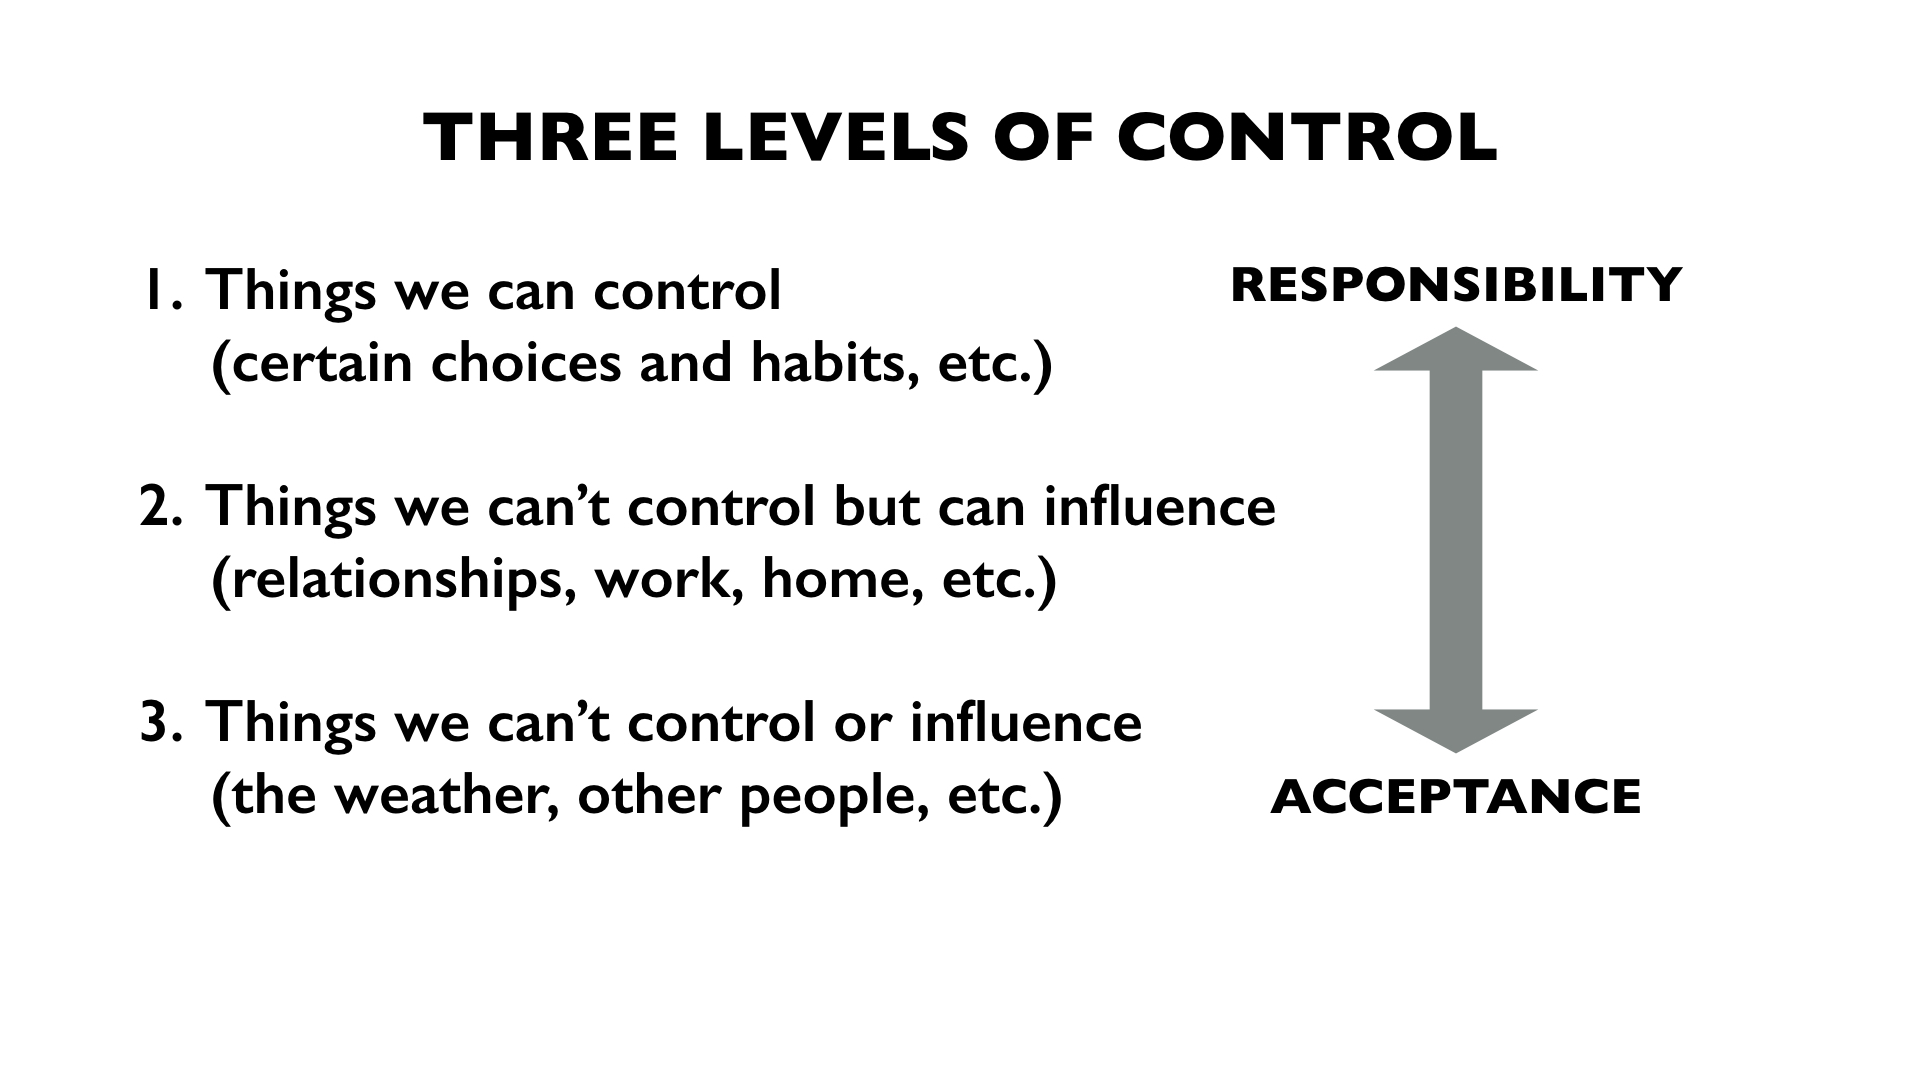 Three levels of control